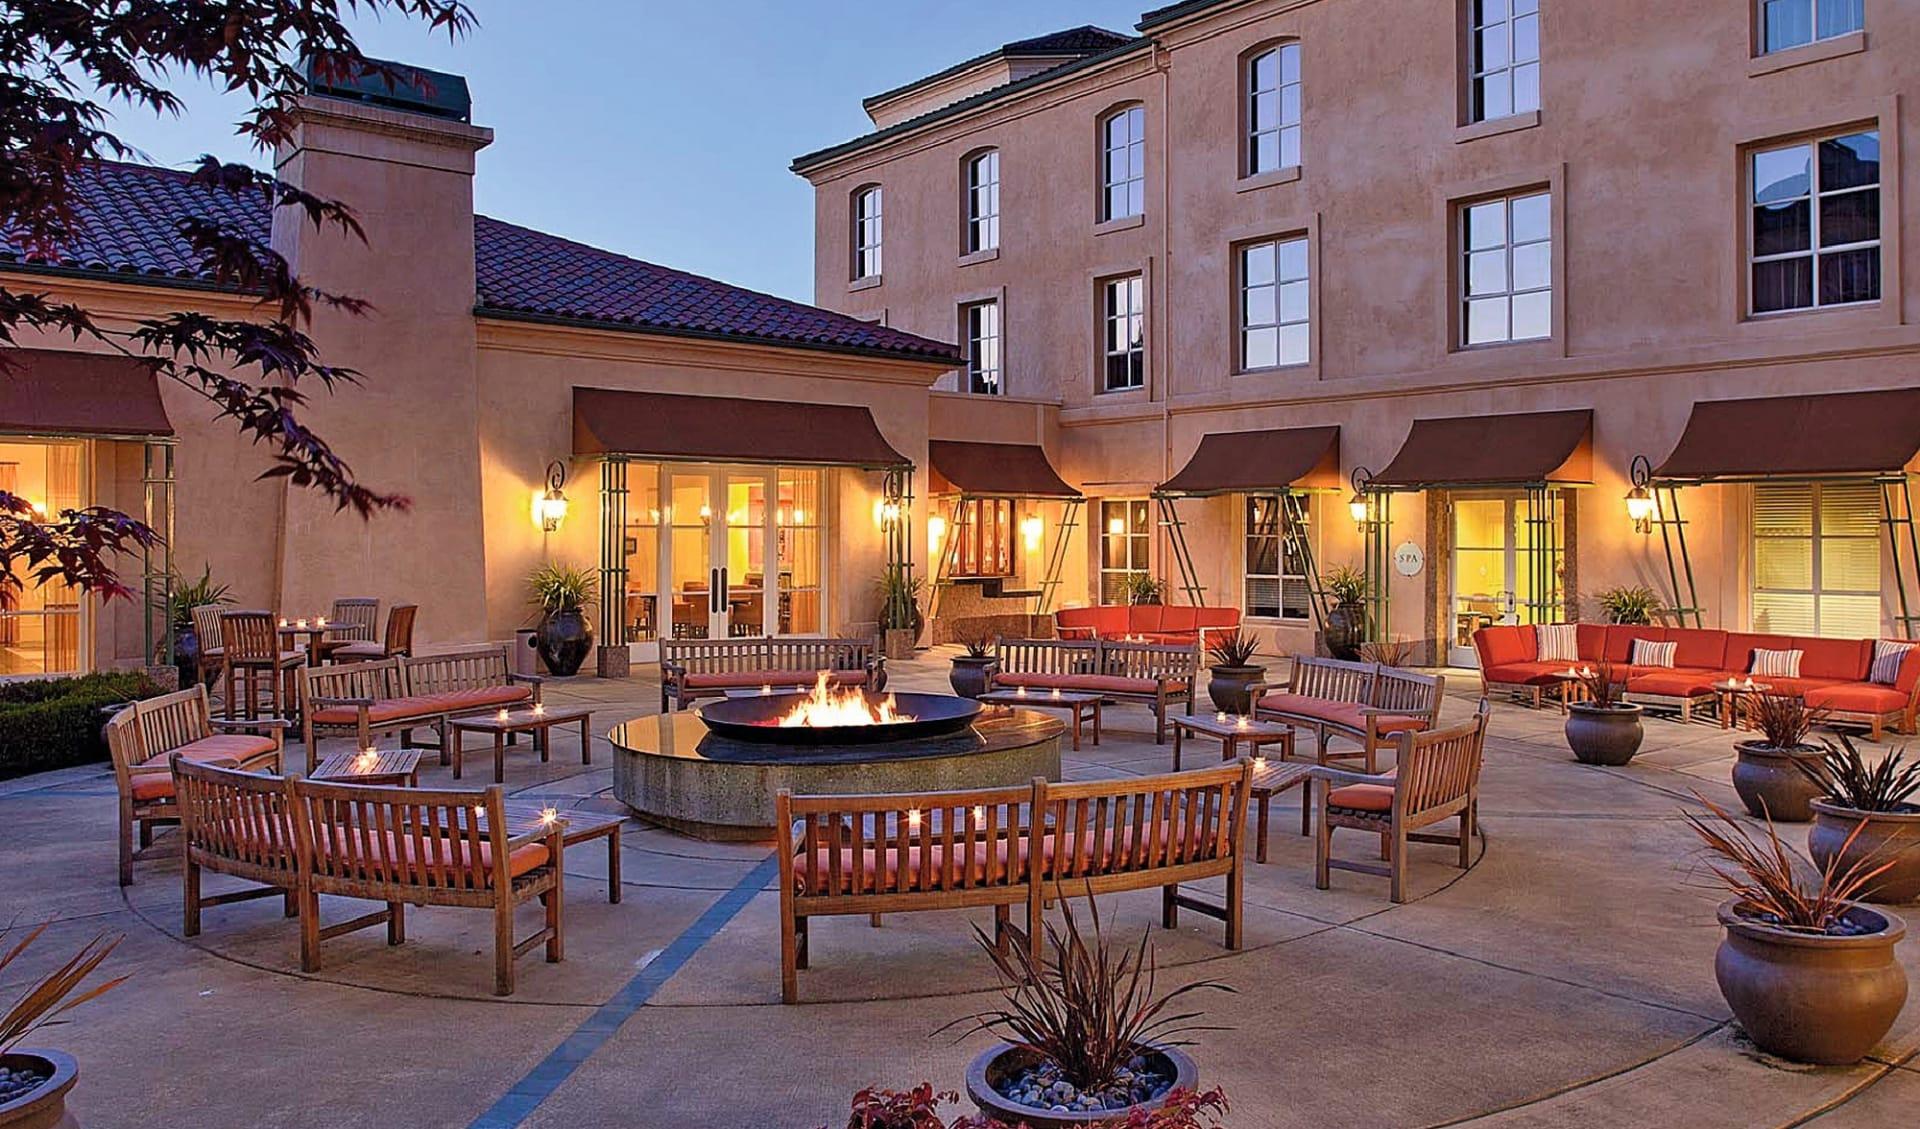 Hyatt Regency Sonoma Wine Country in Santa Rosa: facilities hyatt vineyard creek hotel und spa feuerschale bänke